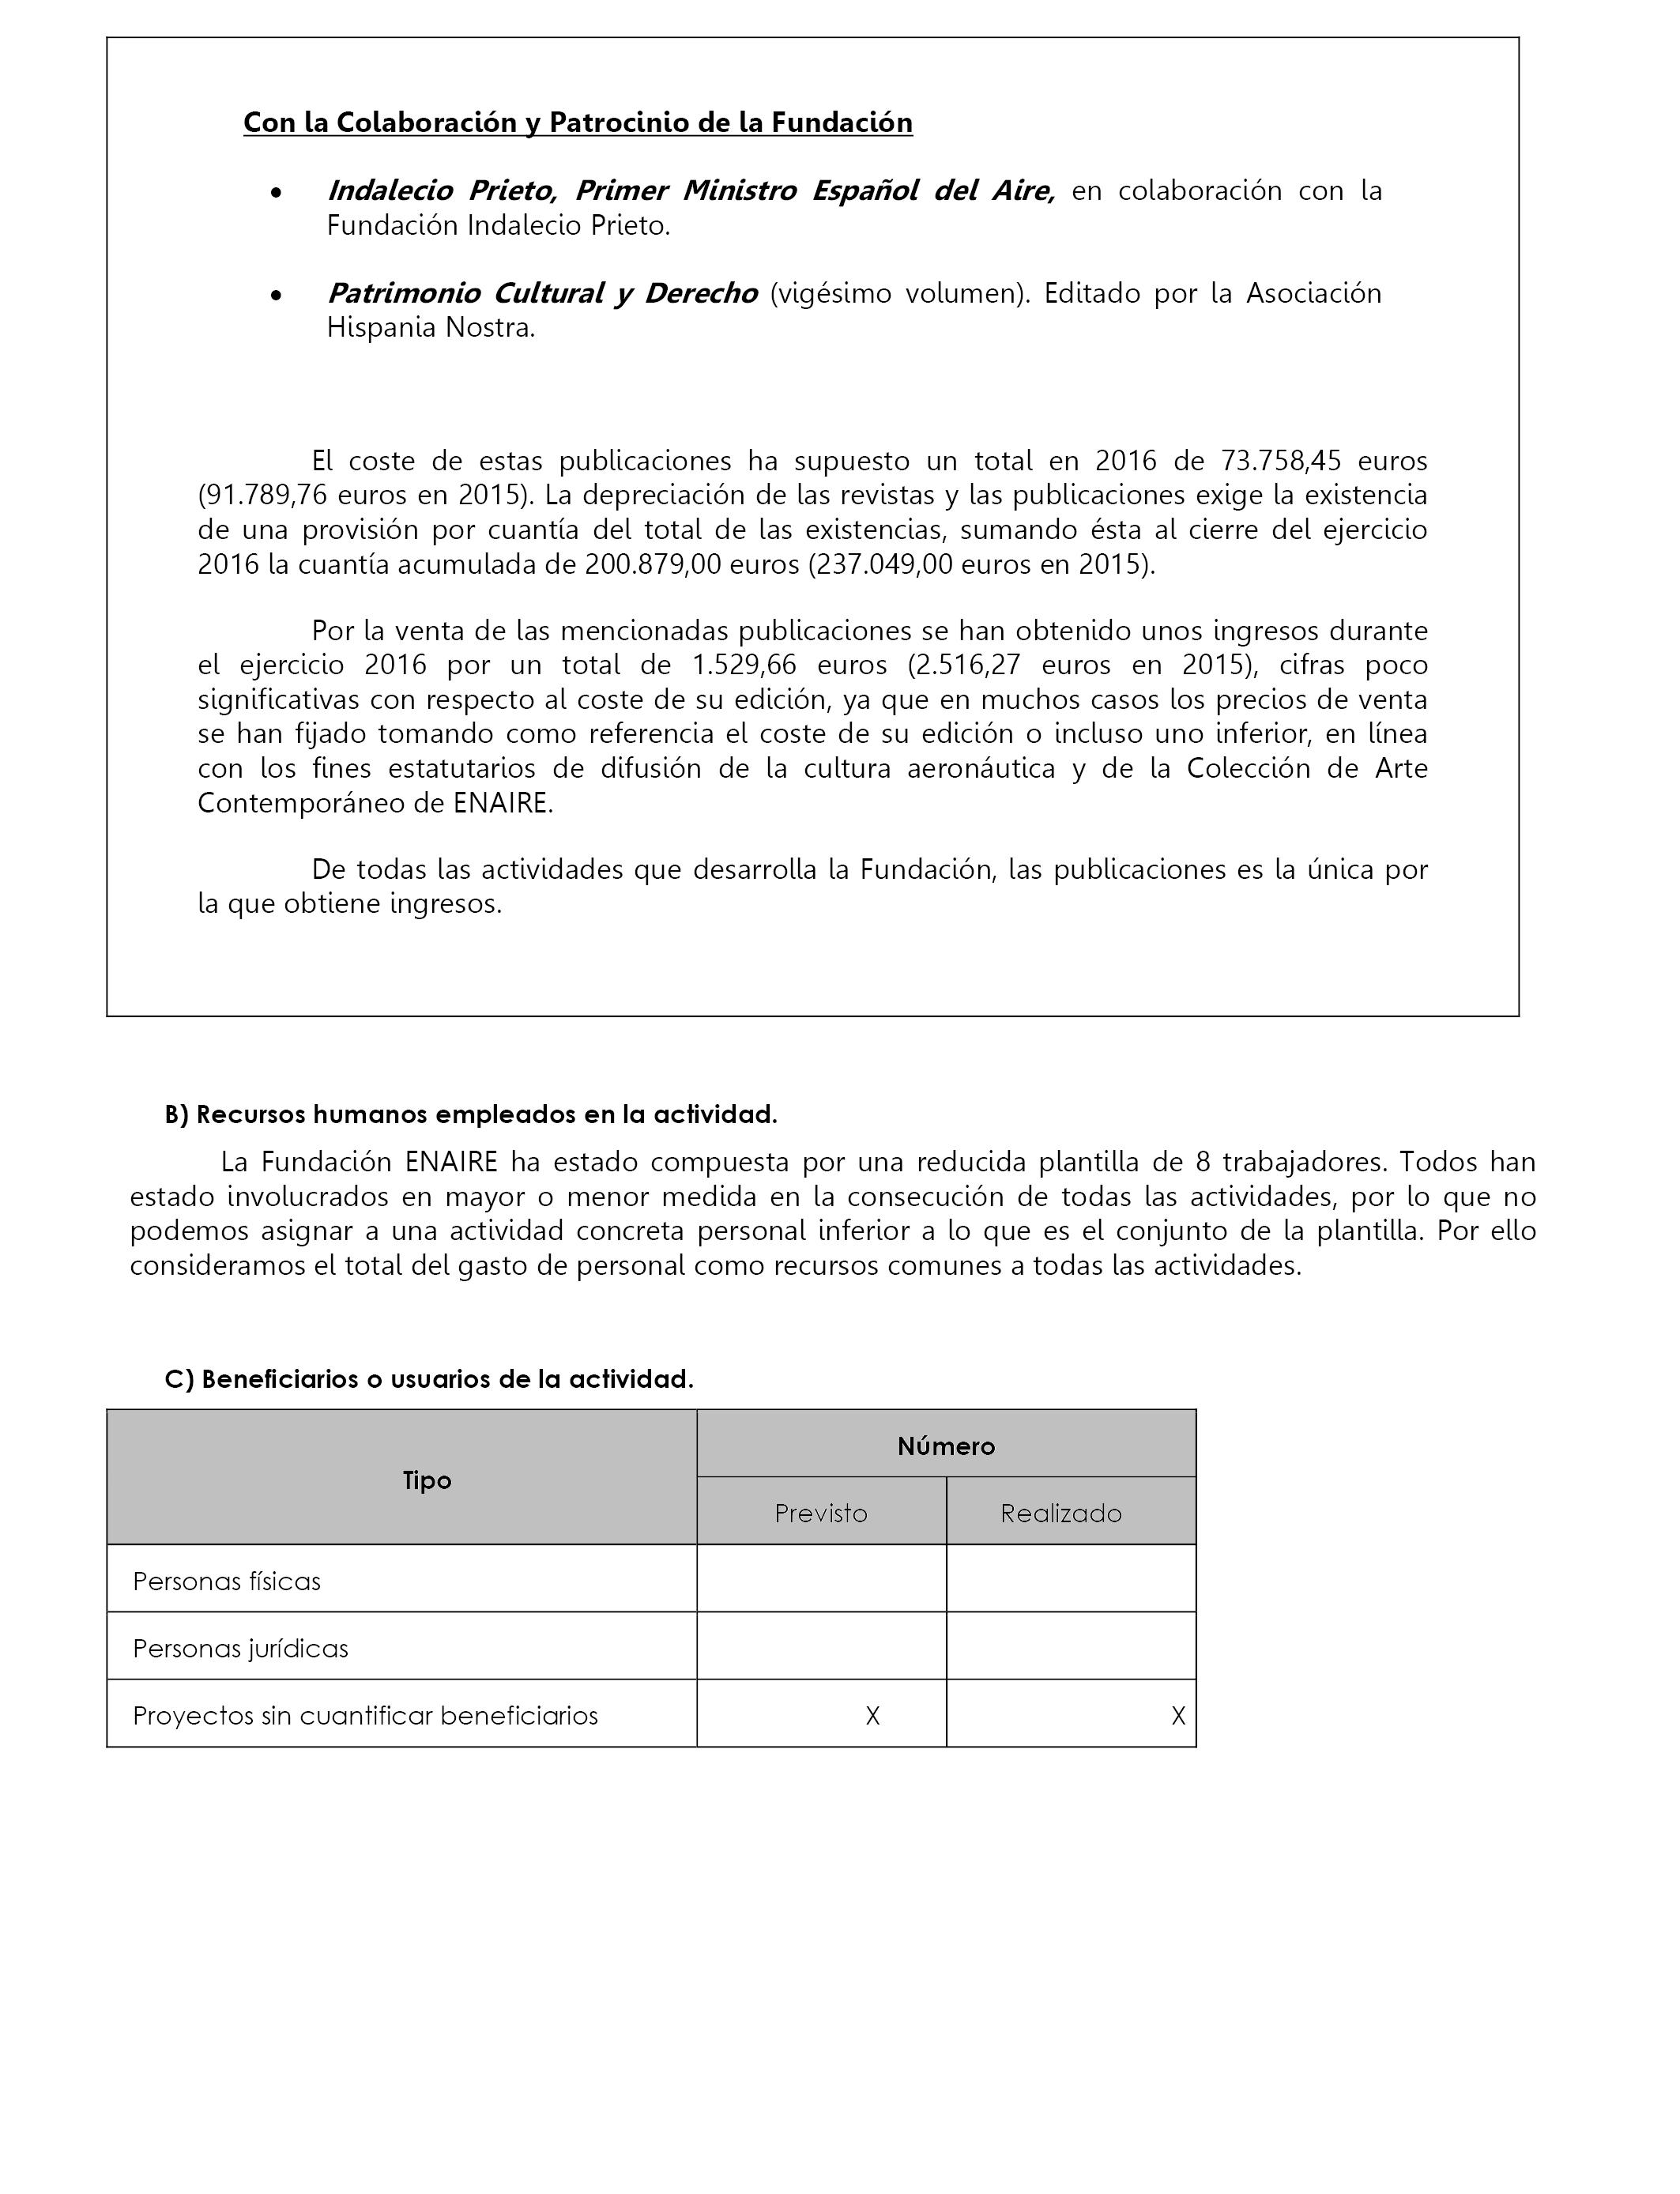 BOE.es - Documento BOE-A-2017-11084